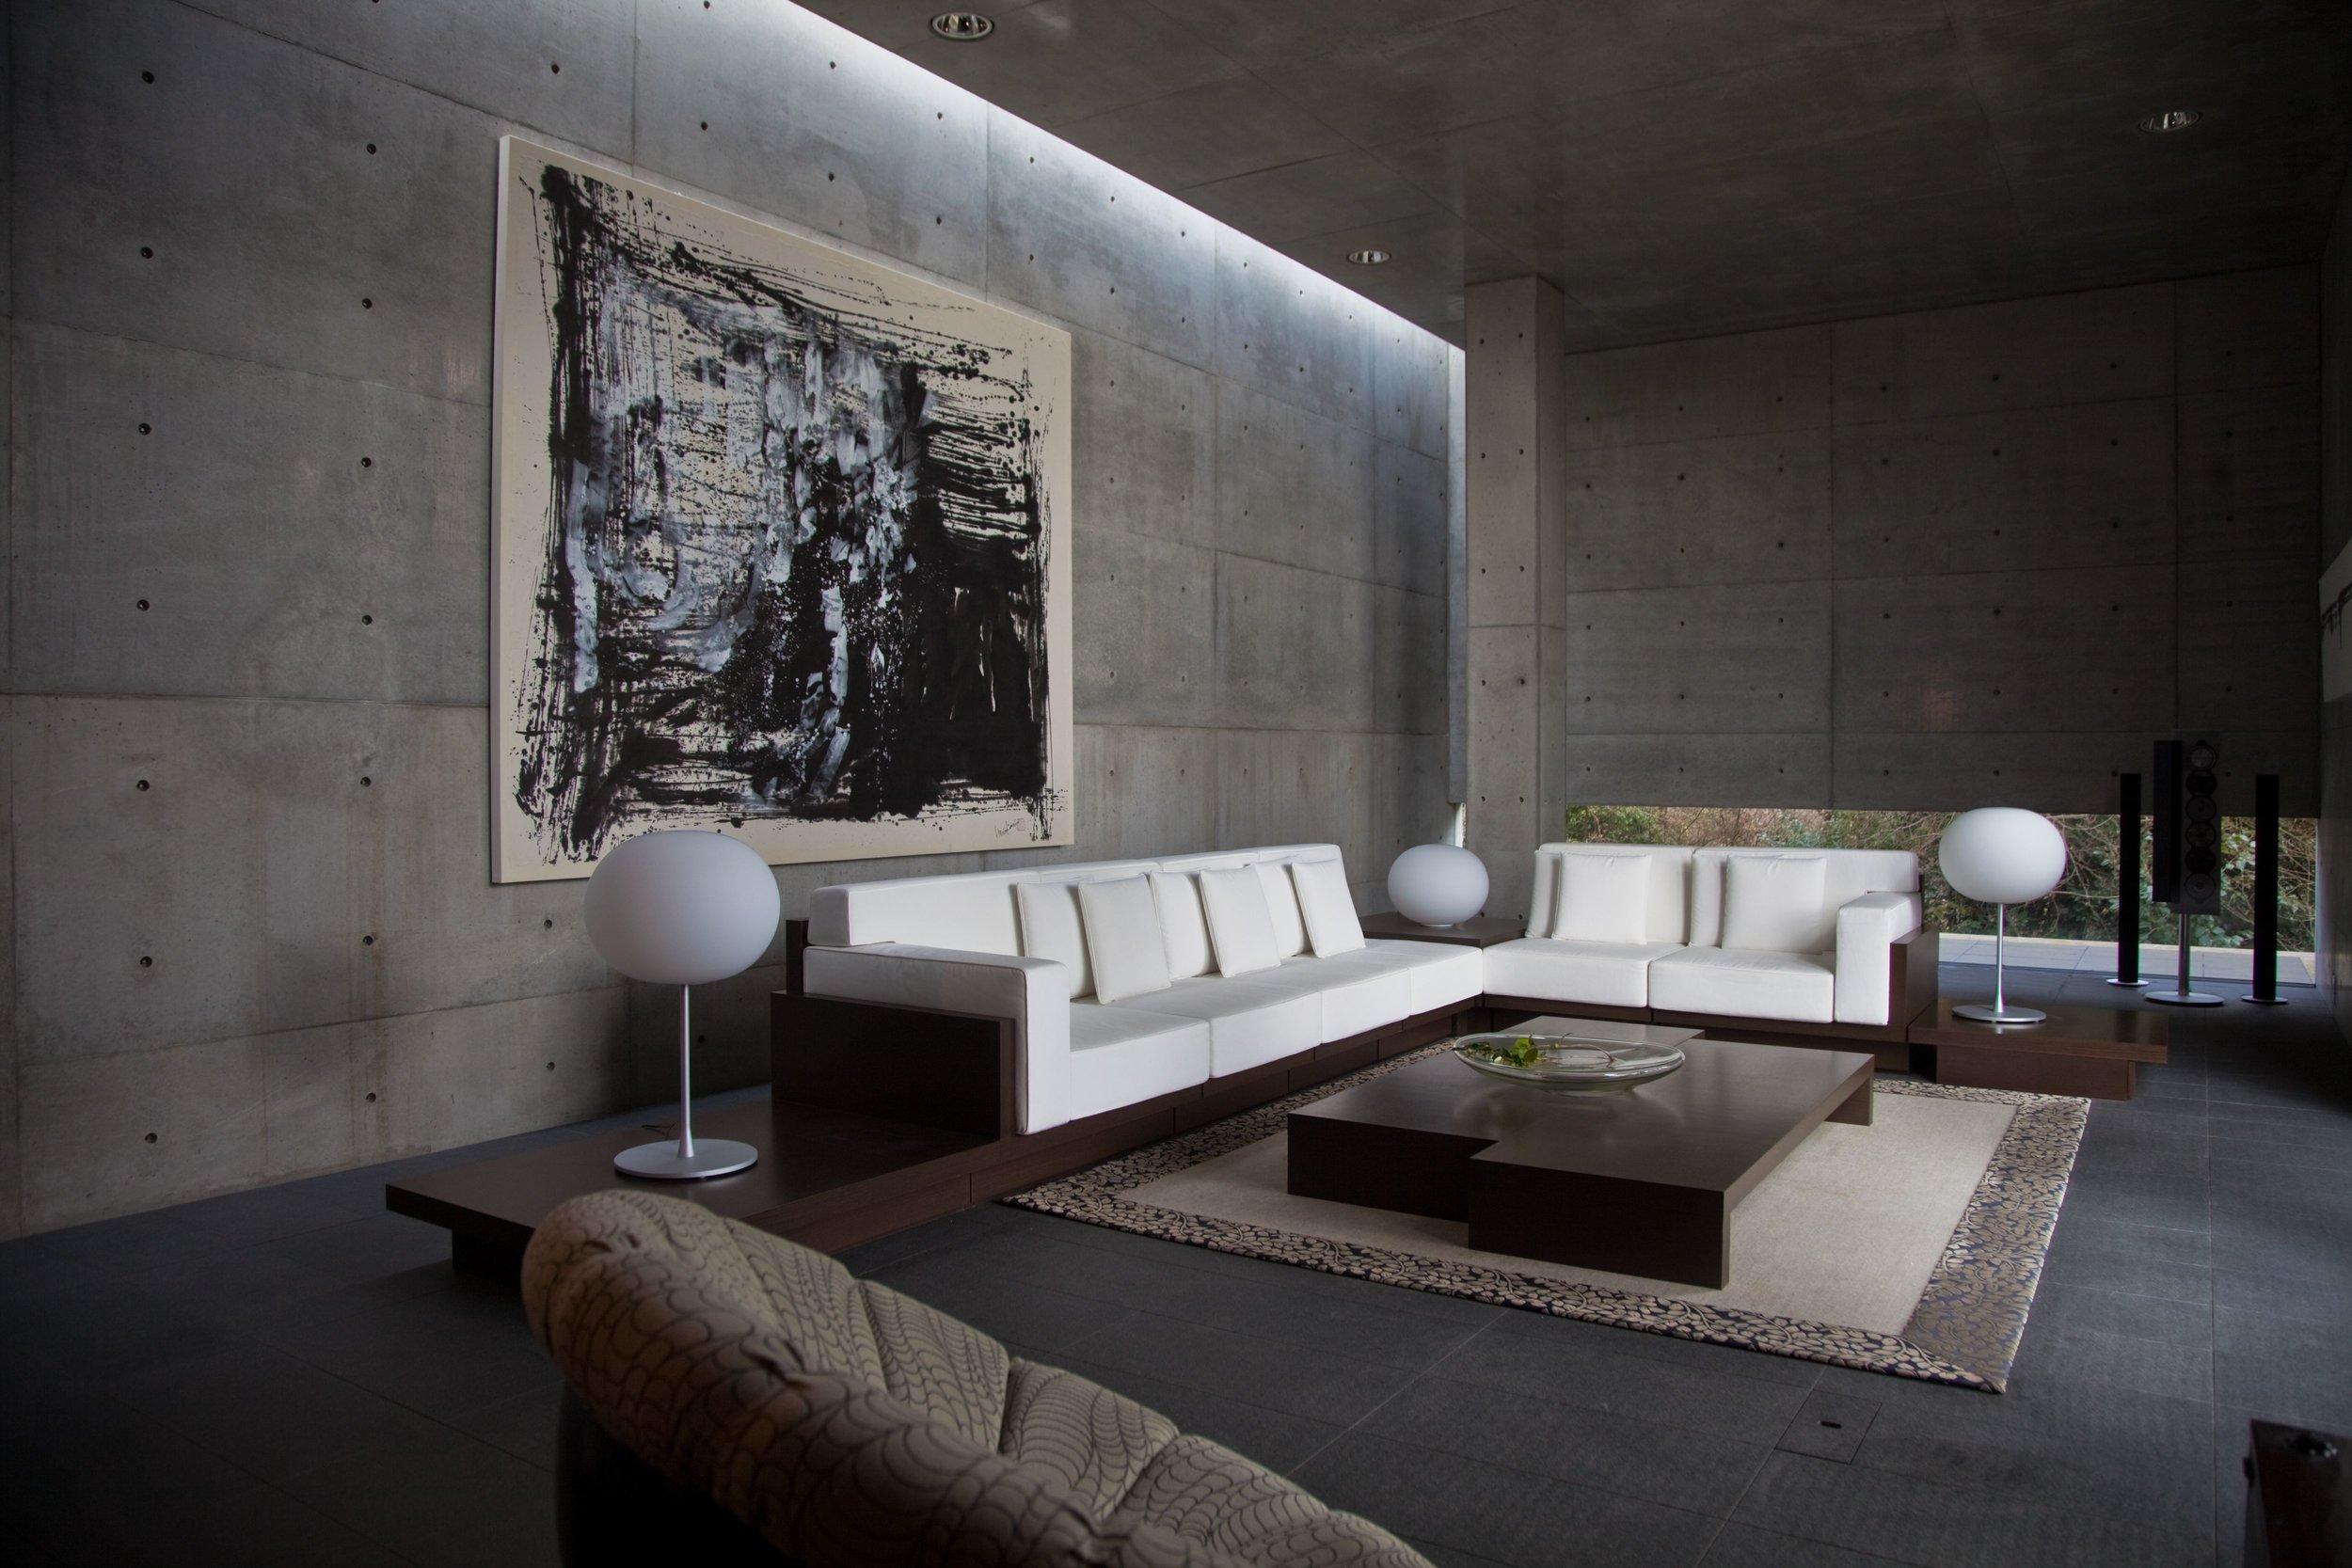 Koshino House by Tadao Ando. Courtesy of Hiroko Koshino. Photo by Michael Fraile, 2011.